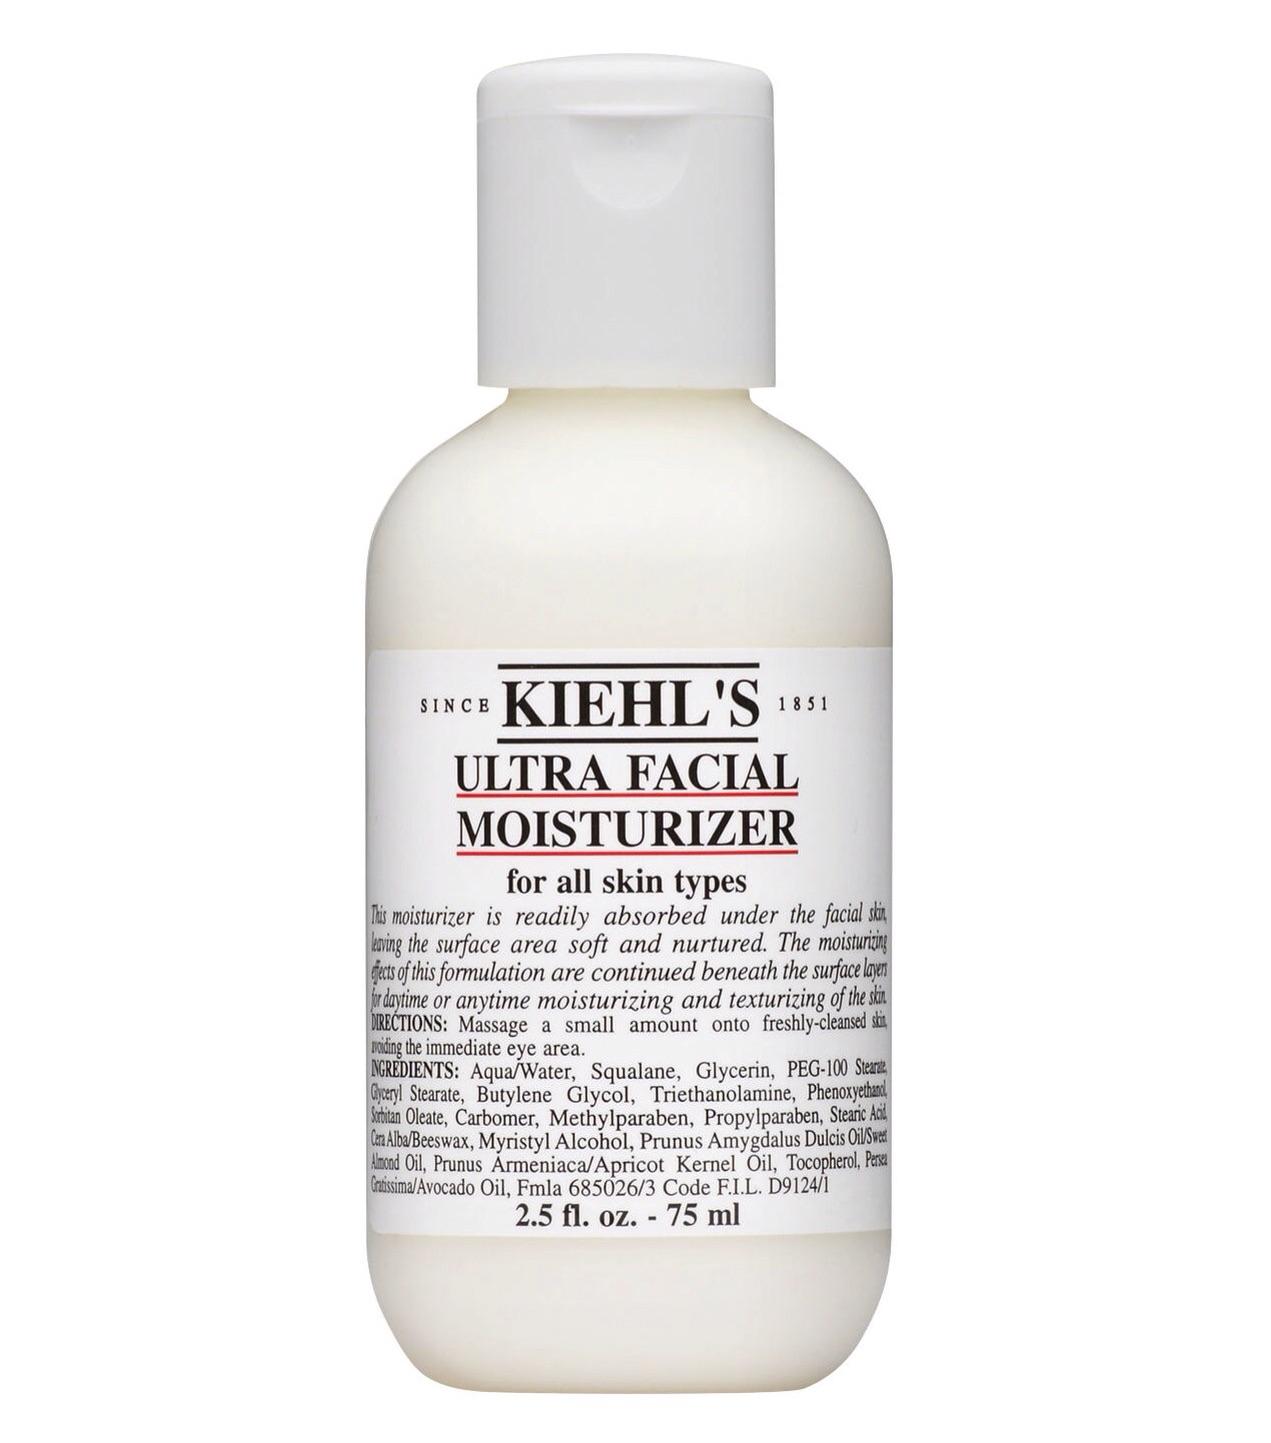 KiehlsUltra FacialMoisturizer, $22 for 75ml   Kiehls